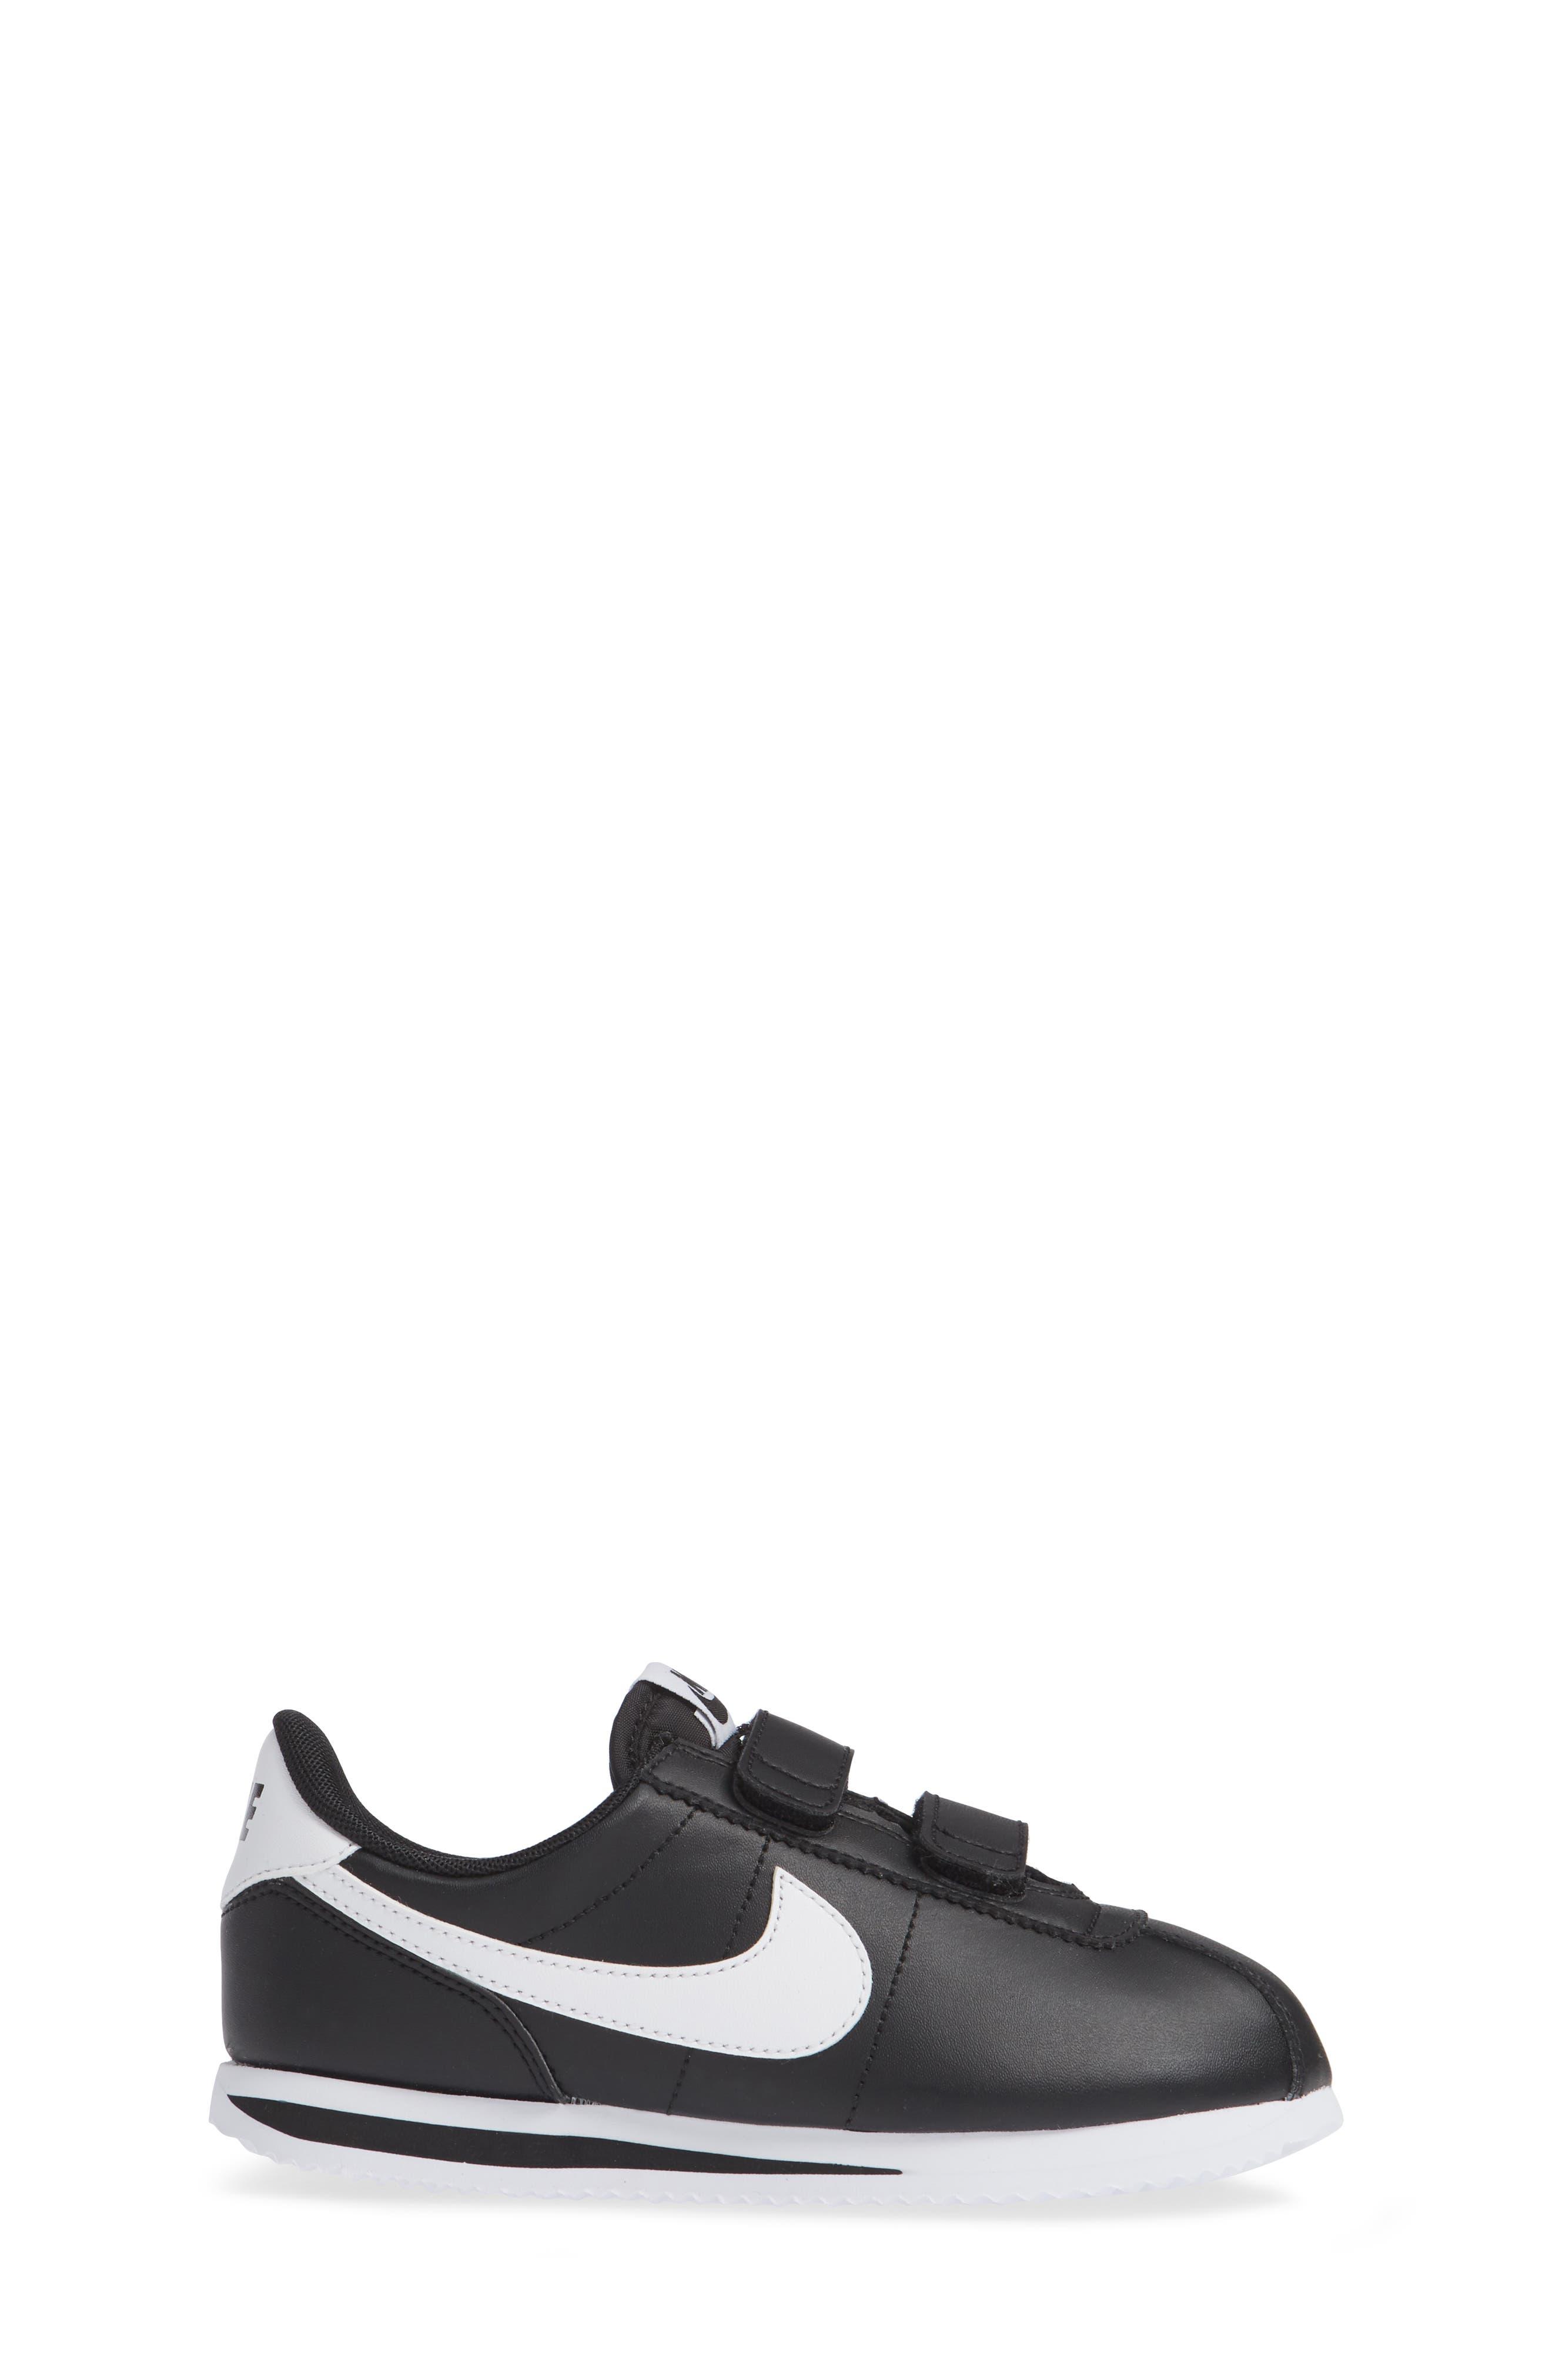 Cortez Basic SL Sneaker,                             Alternate thumbnail 4, color,                             Black/ White